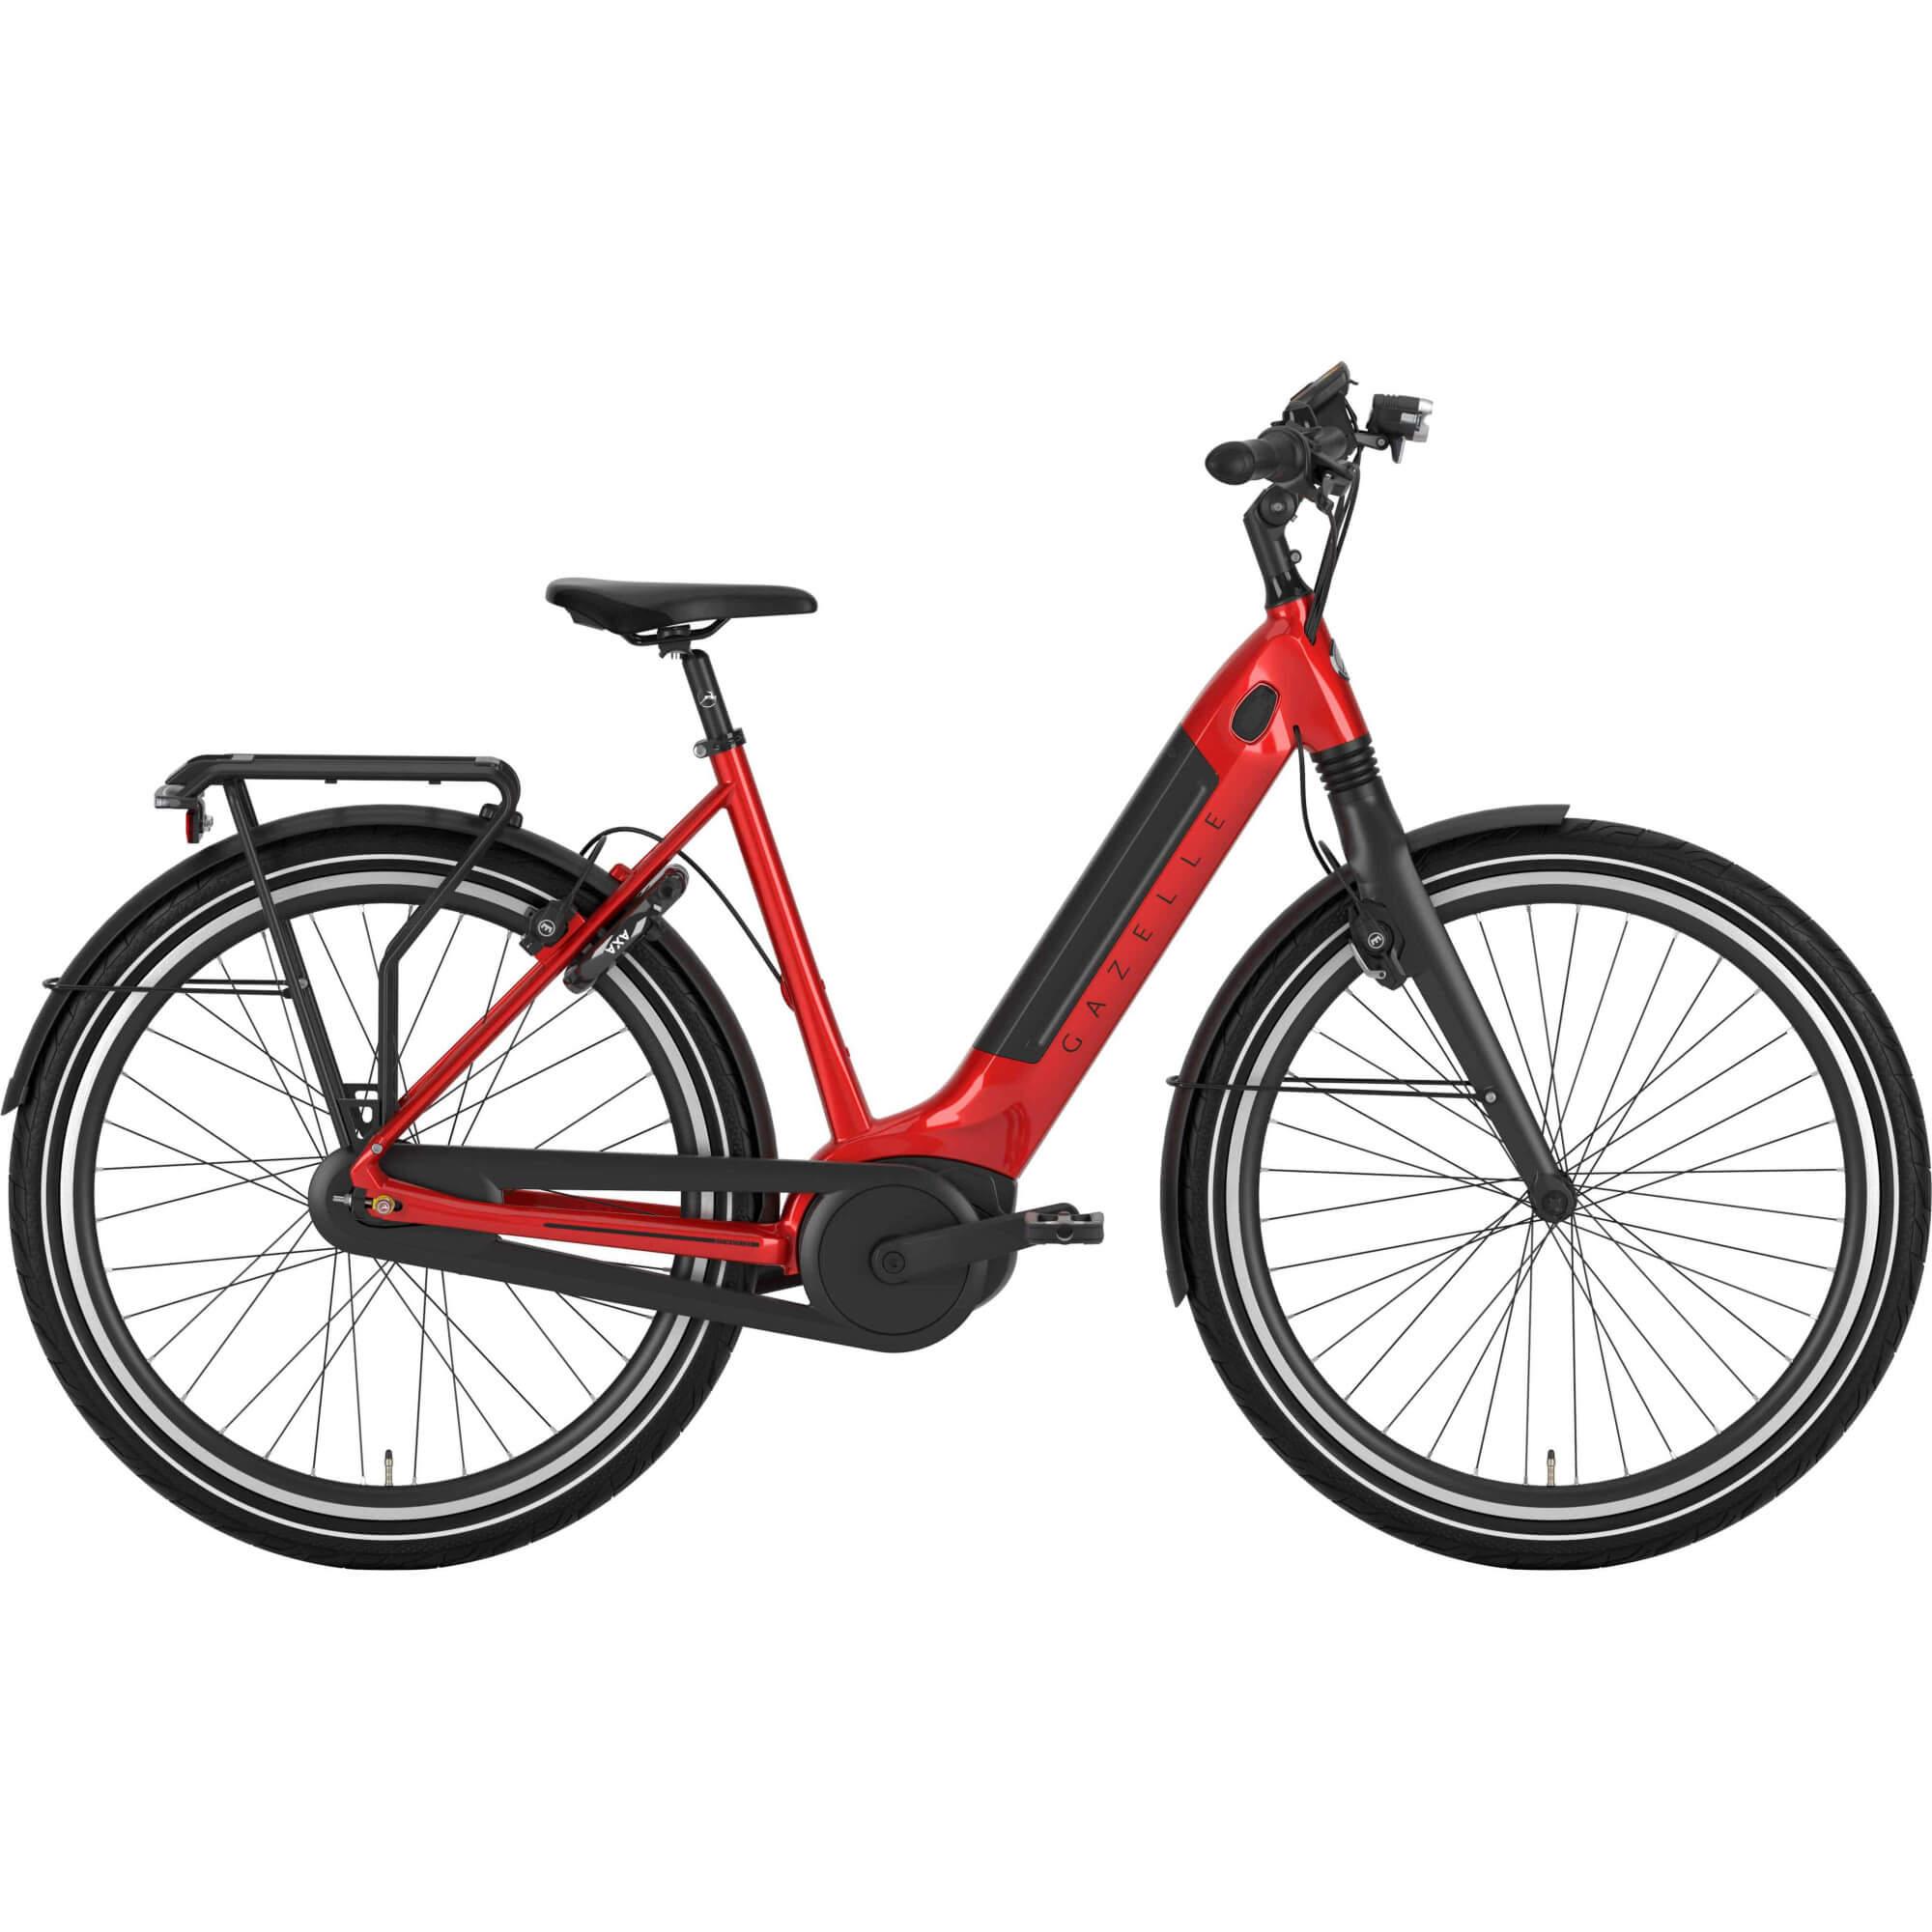 Gazelle Ultimate C8+ HMB dameelcykel i Champion Red